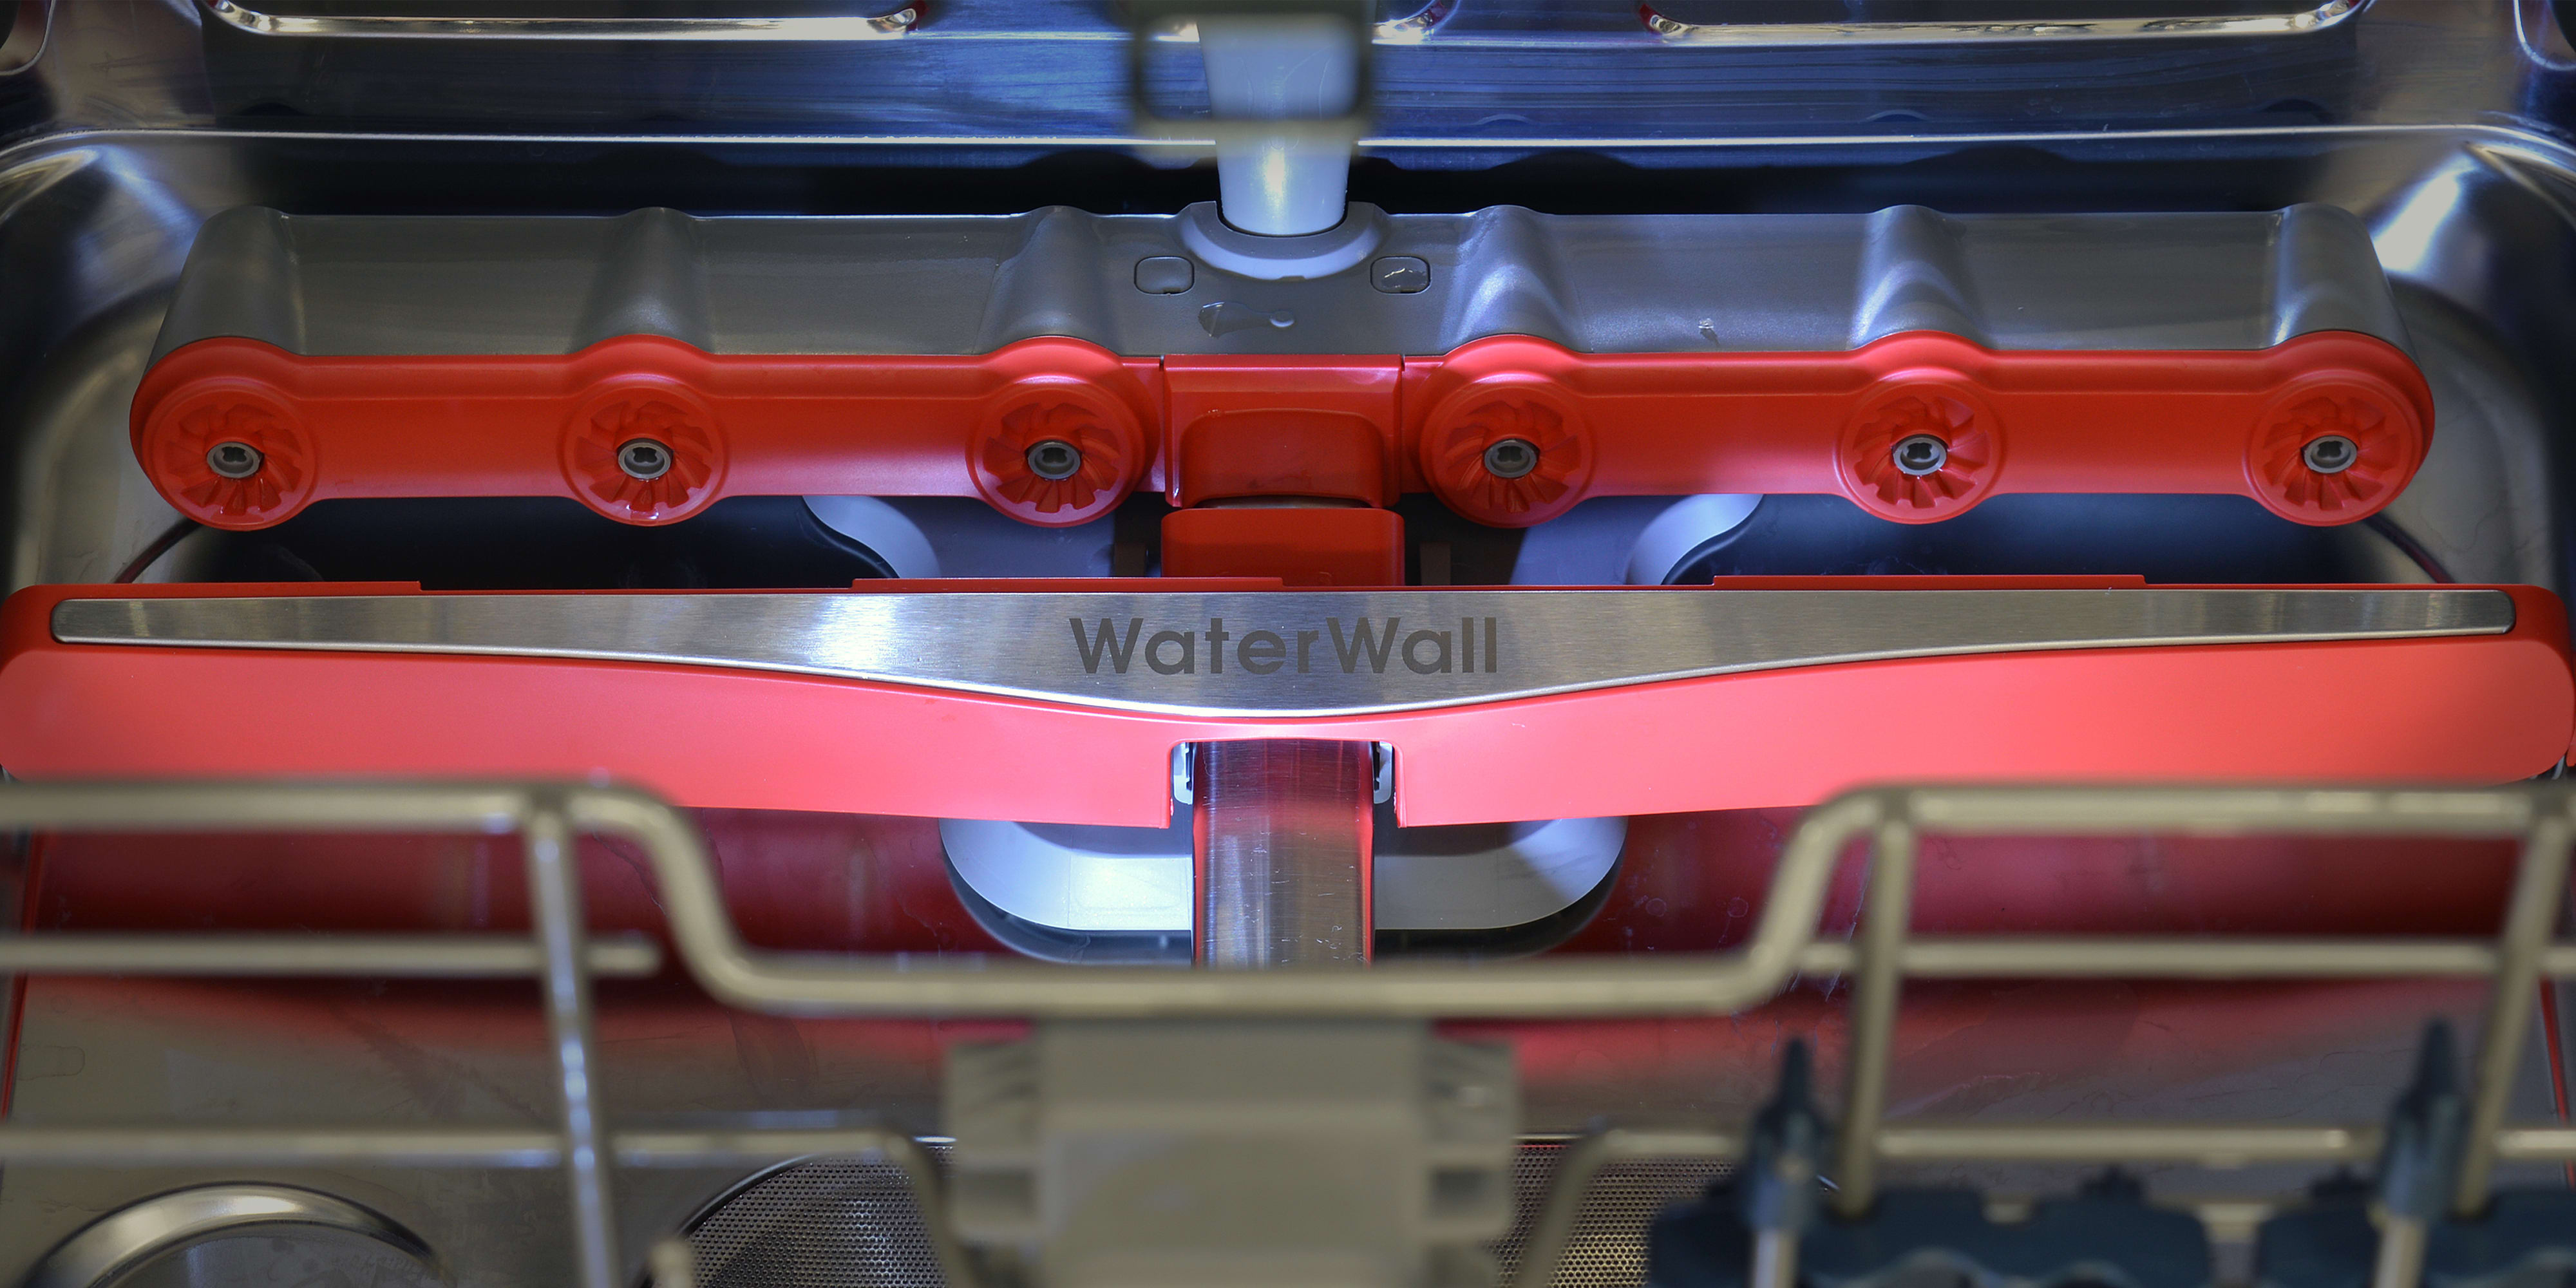 Samsung DW80J7550US WaterWall